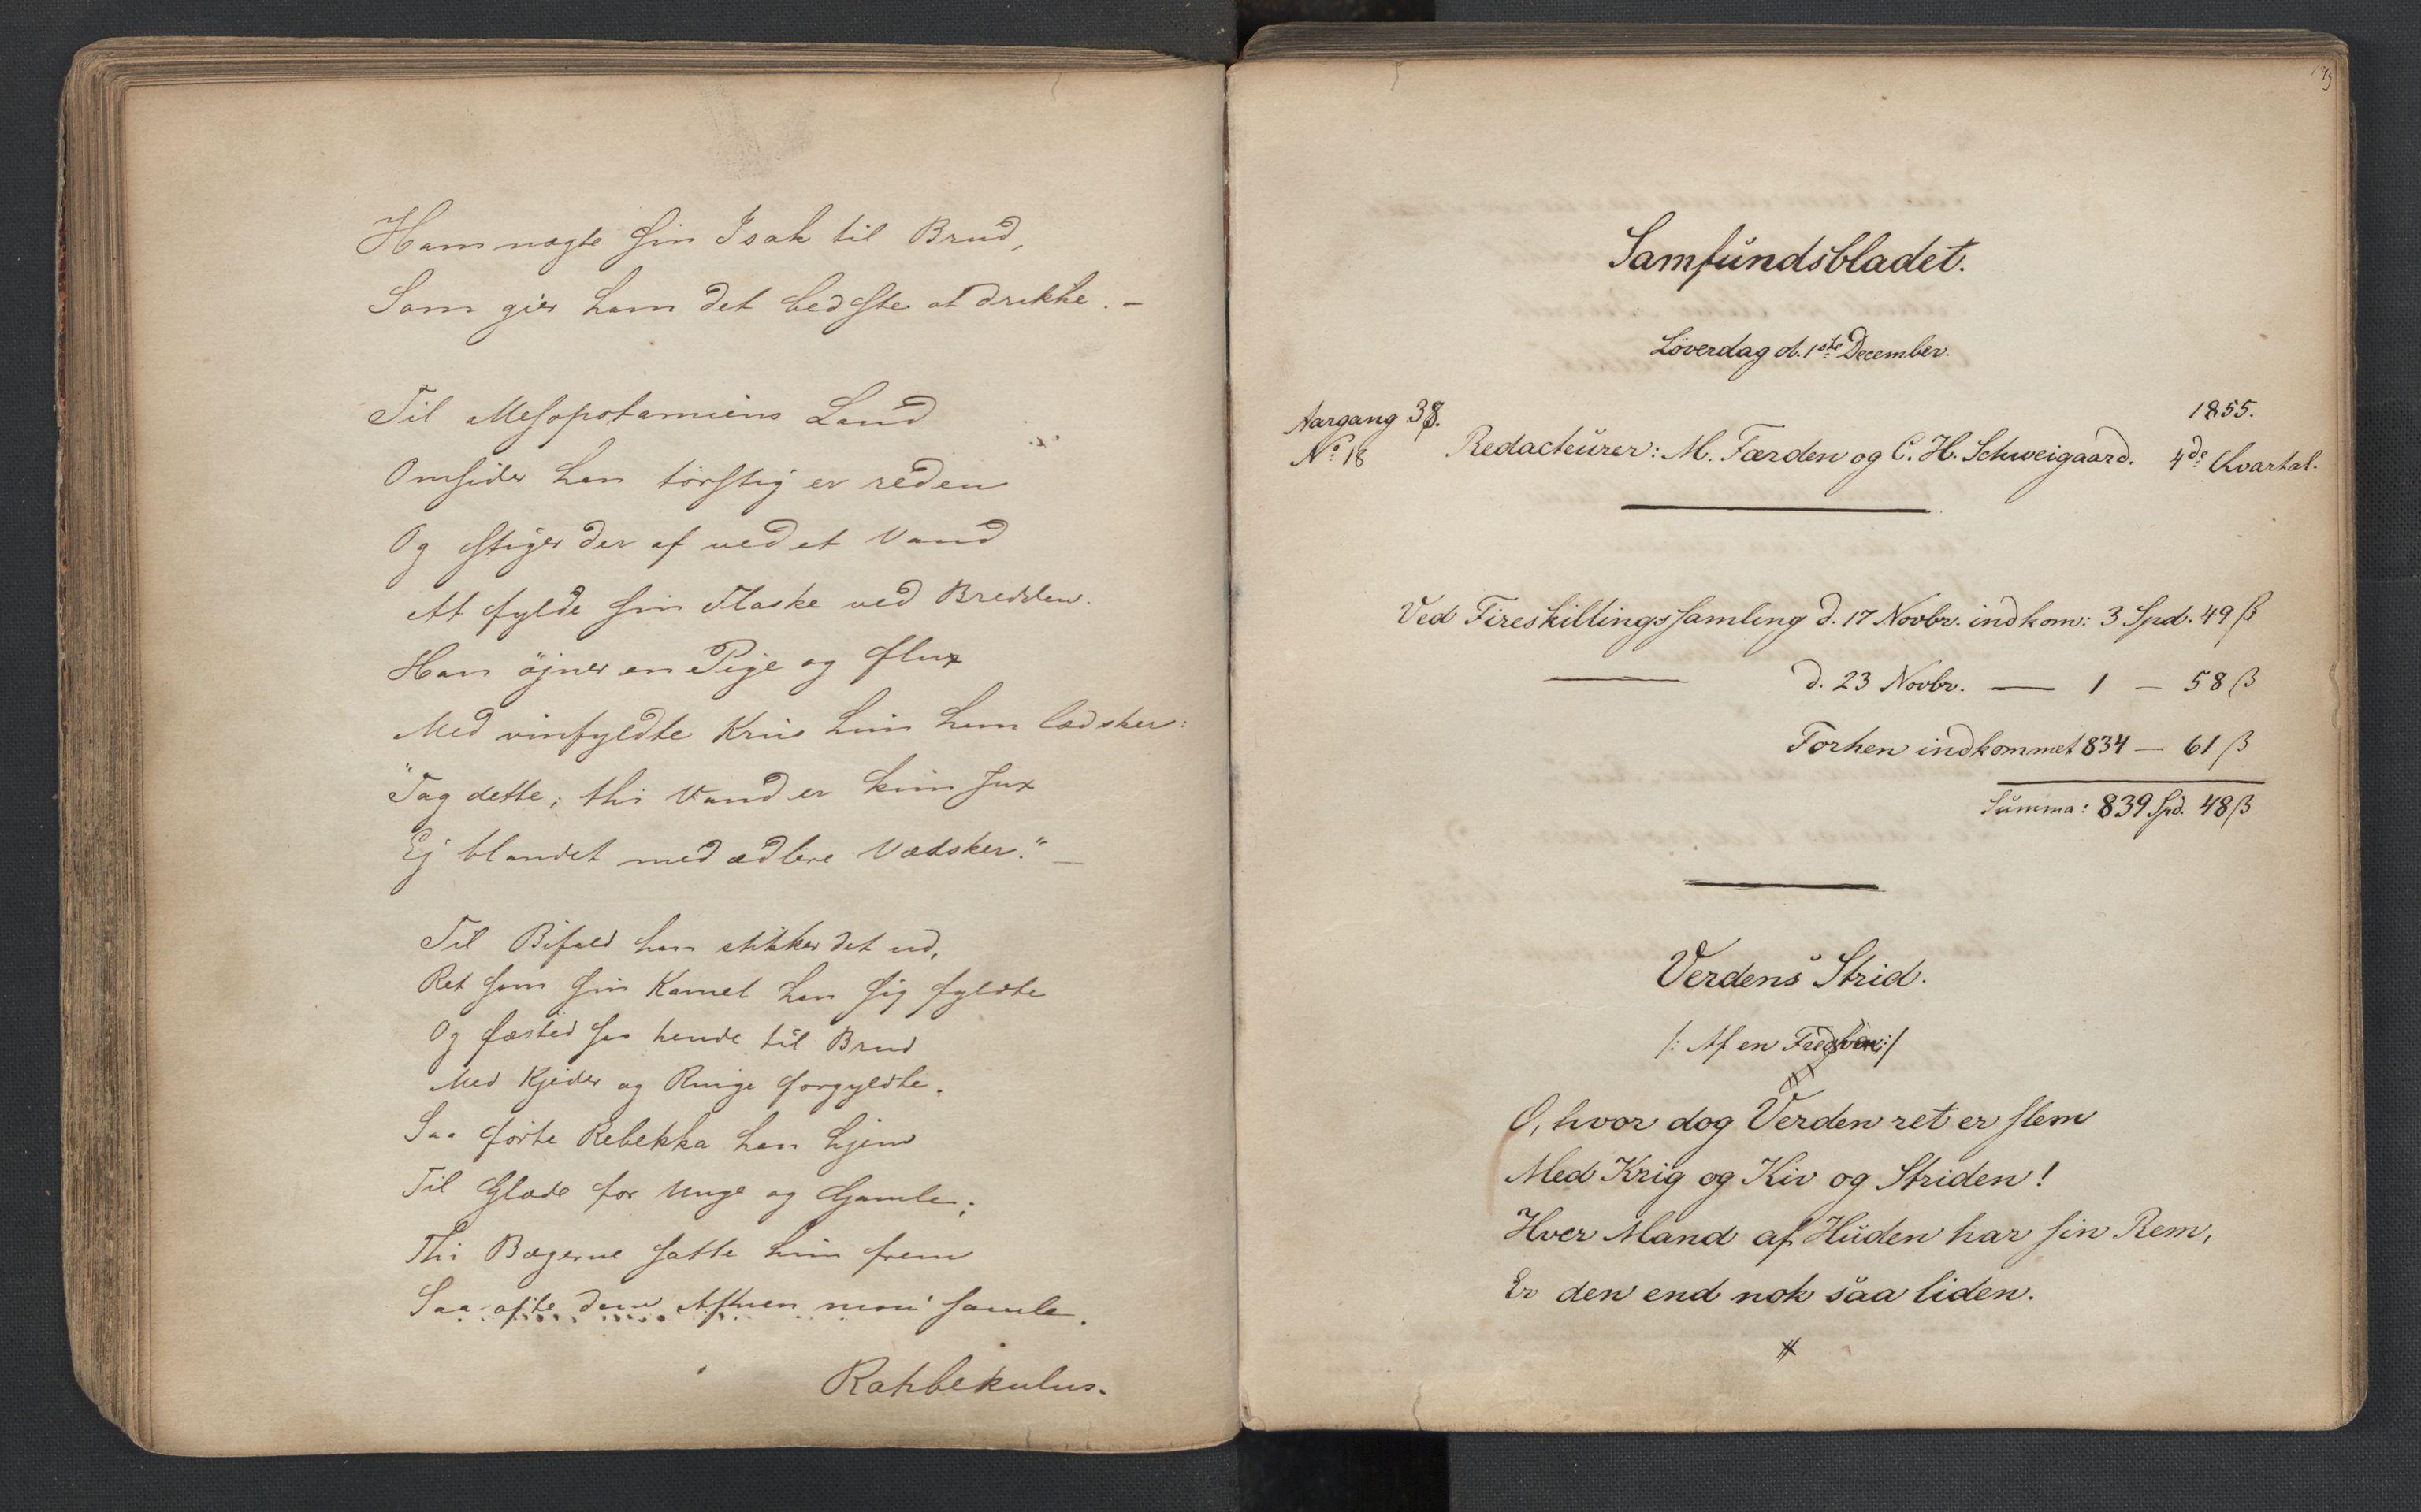 RA, Det Norske Studentersamfund, X/Xa/L0005, 1855-1856, s. 76